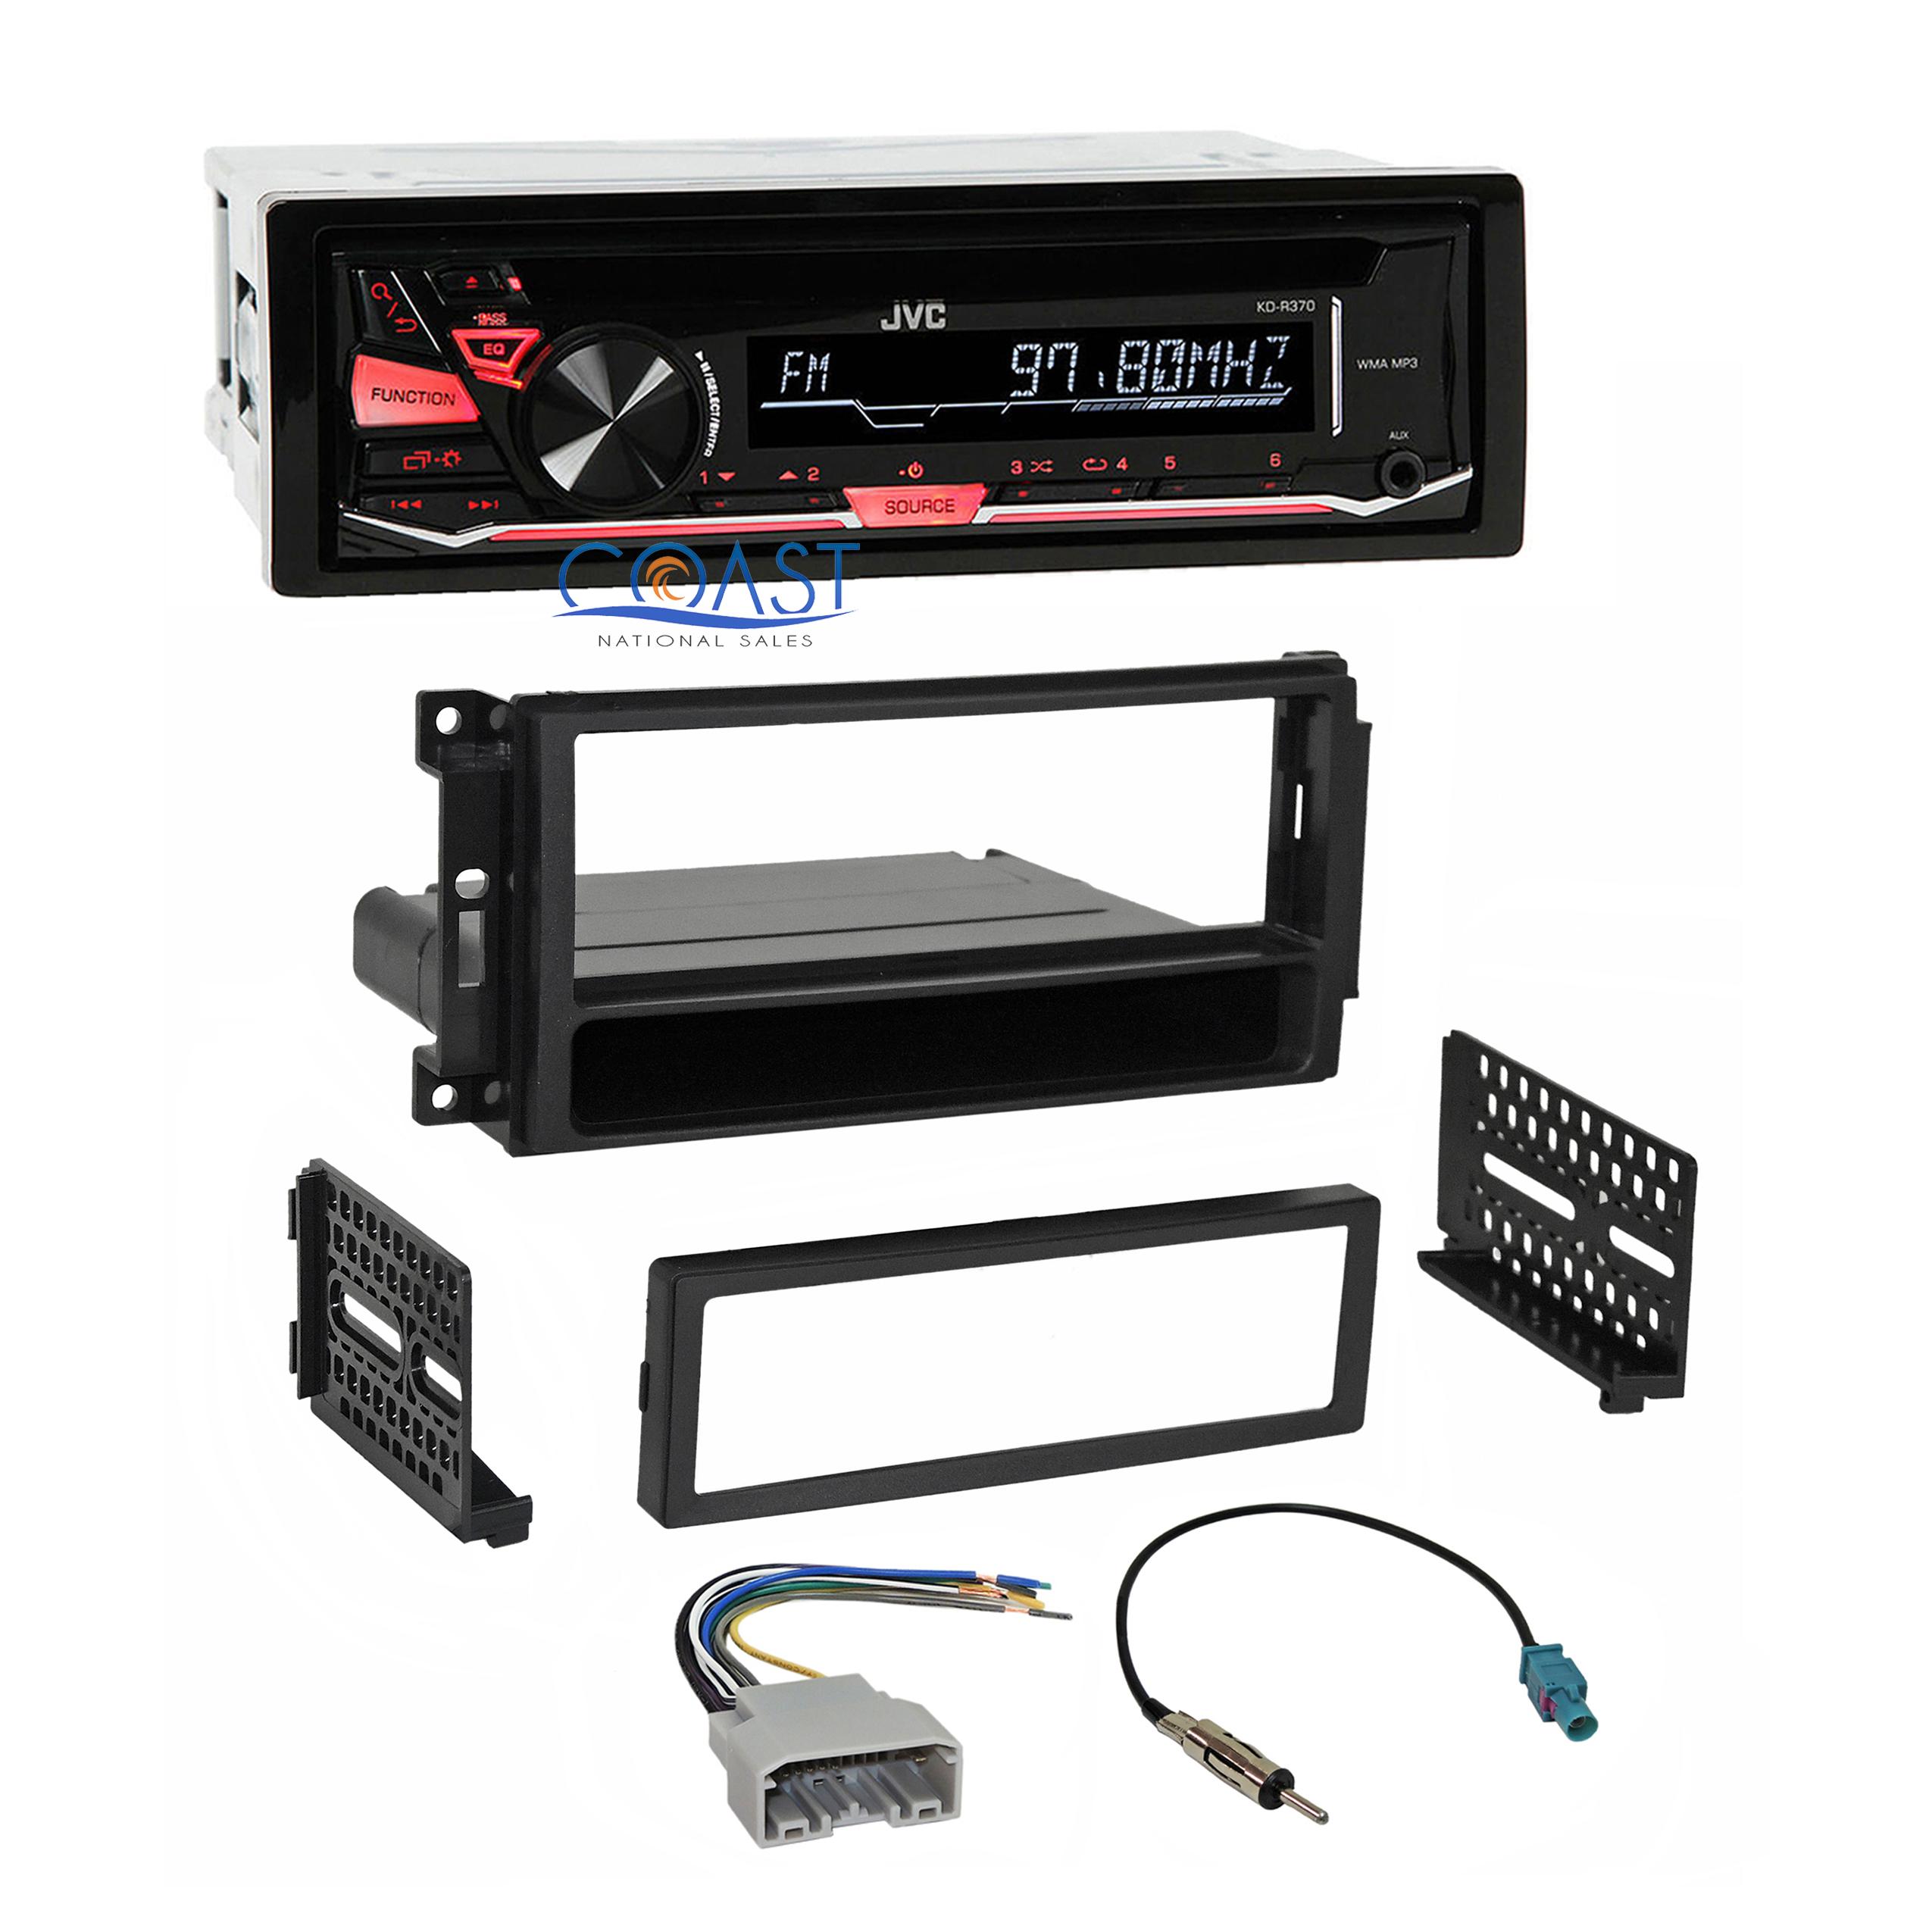 Enjoyable Jvc Cd Mp3 Car Stereo Dash Kit Wire Harness For 2007 Up Chrysler Wiring Digital Resources Inamasemecshebarightsorg